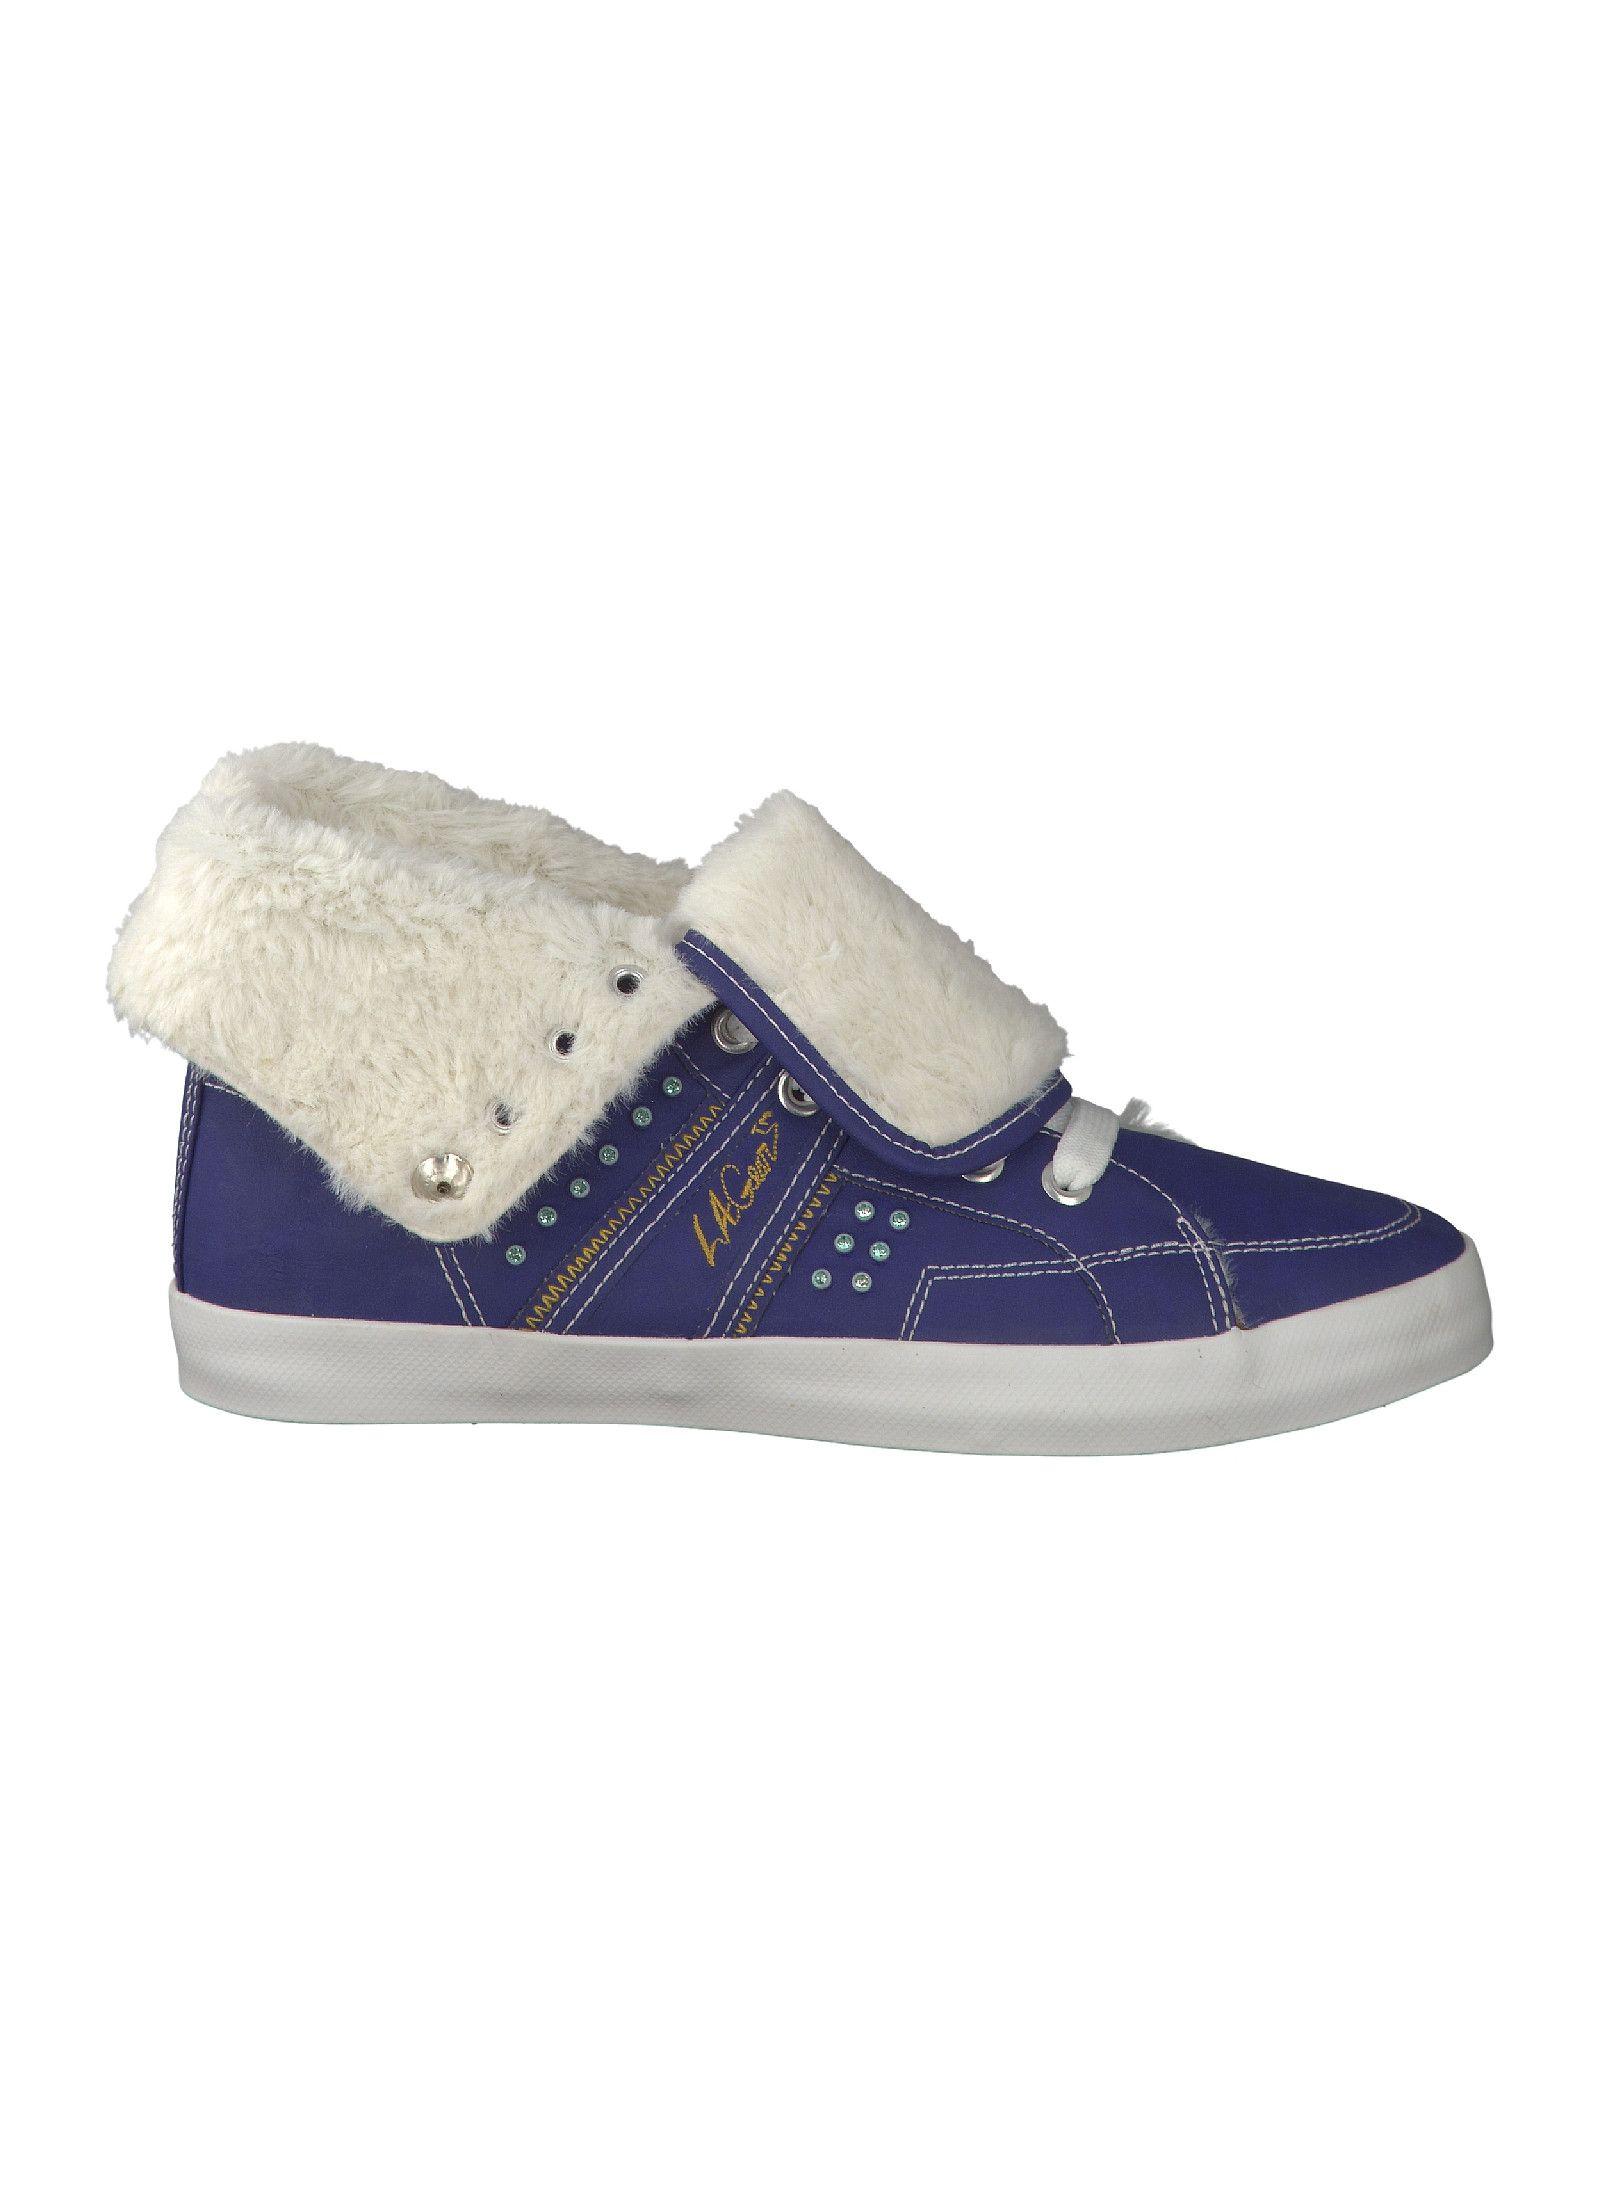 on sale c510a 5adbc Reno - LA Gear - Bootie, Mittelblau - Sneaker - Damen ...